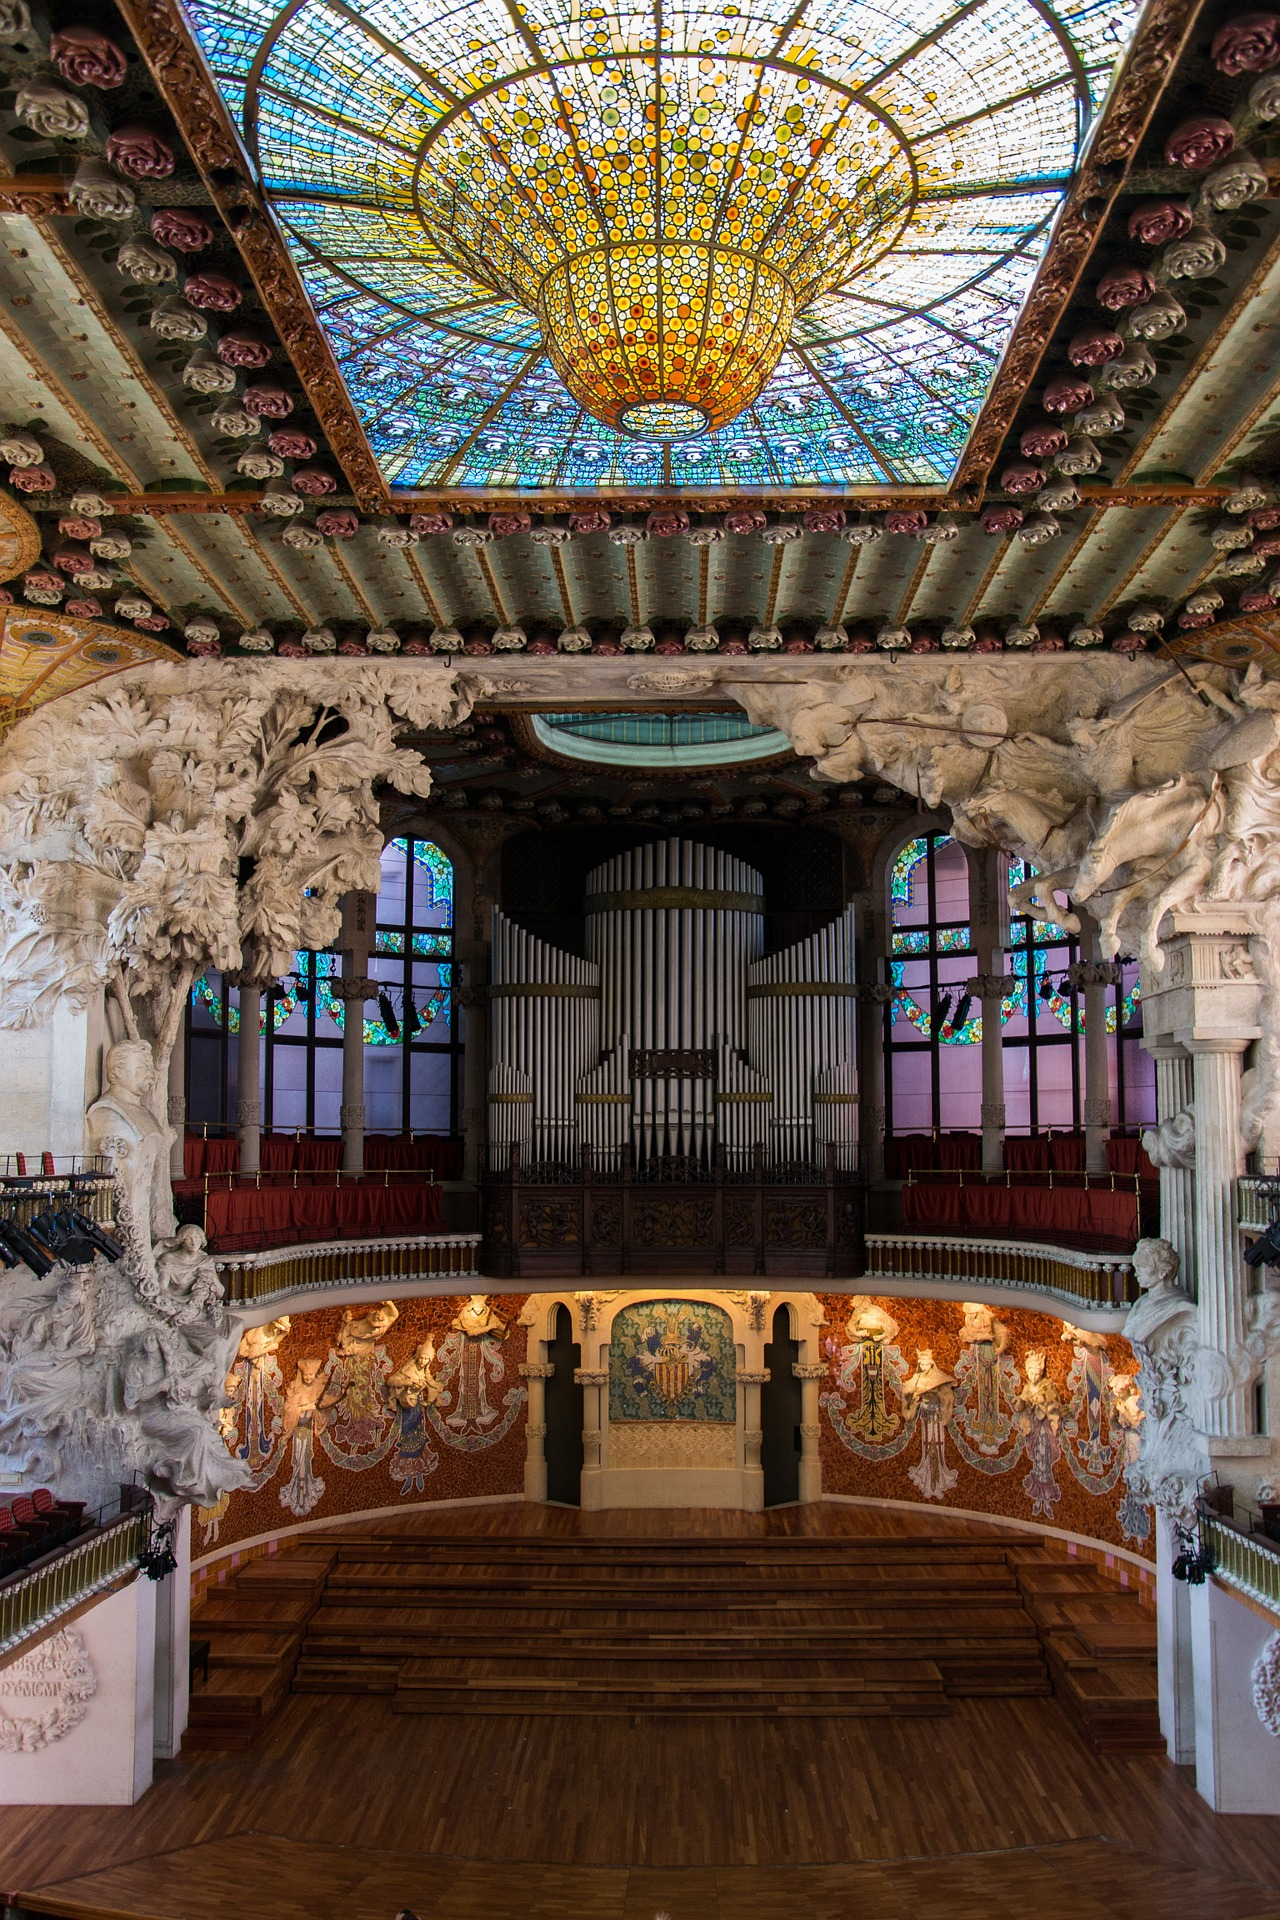 The Palau de la Música Catalana, Barcelona, Spain